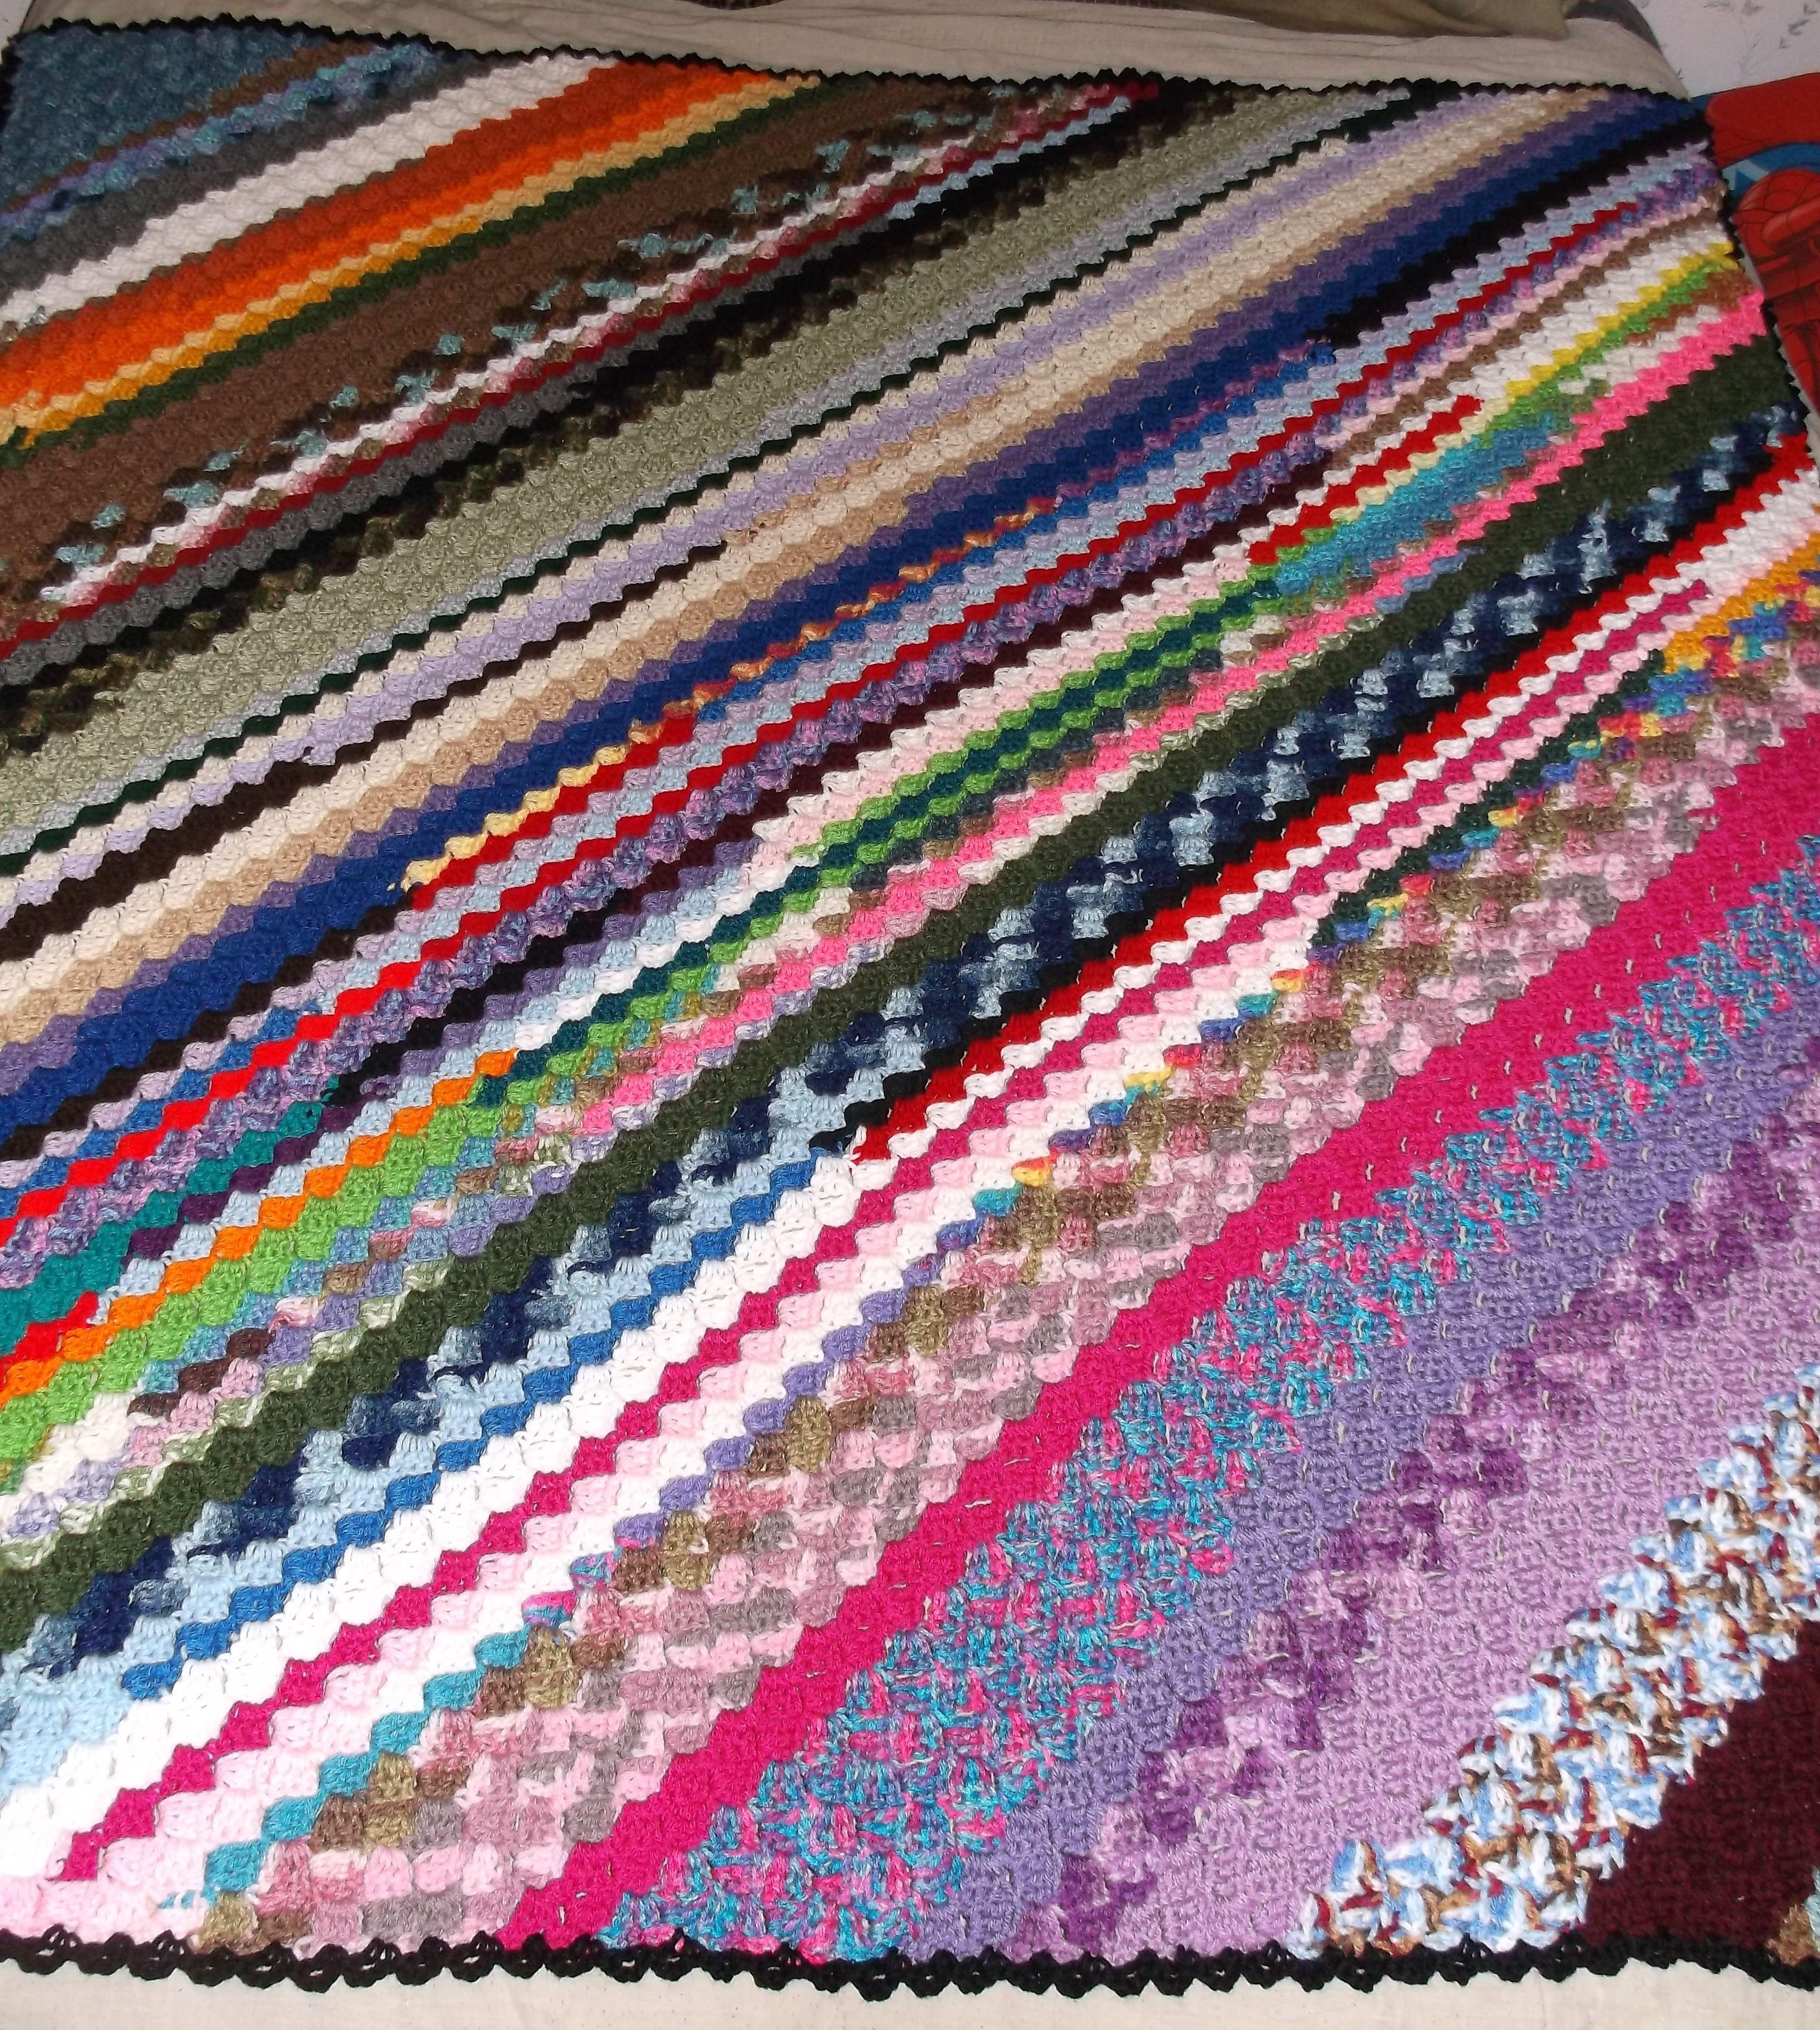 Corner 2 corner scrapghan crochet afghan car blanket httpwww corner 2 corner scrapghan crochet afghan car blanket httpredheart bankloansurffo Choice Image